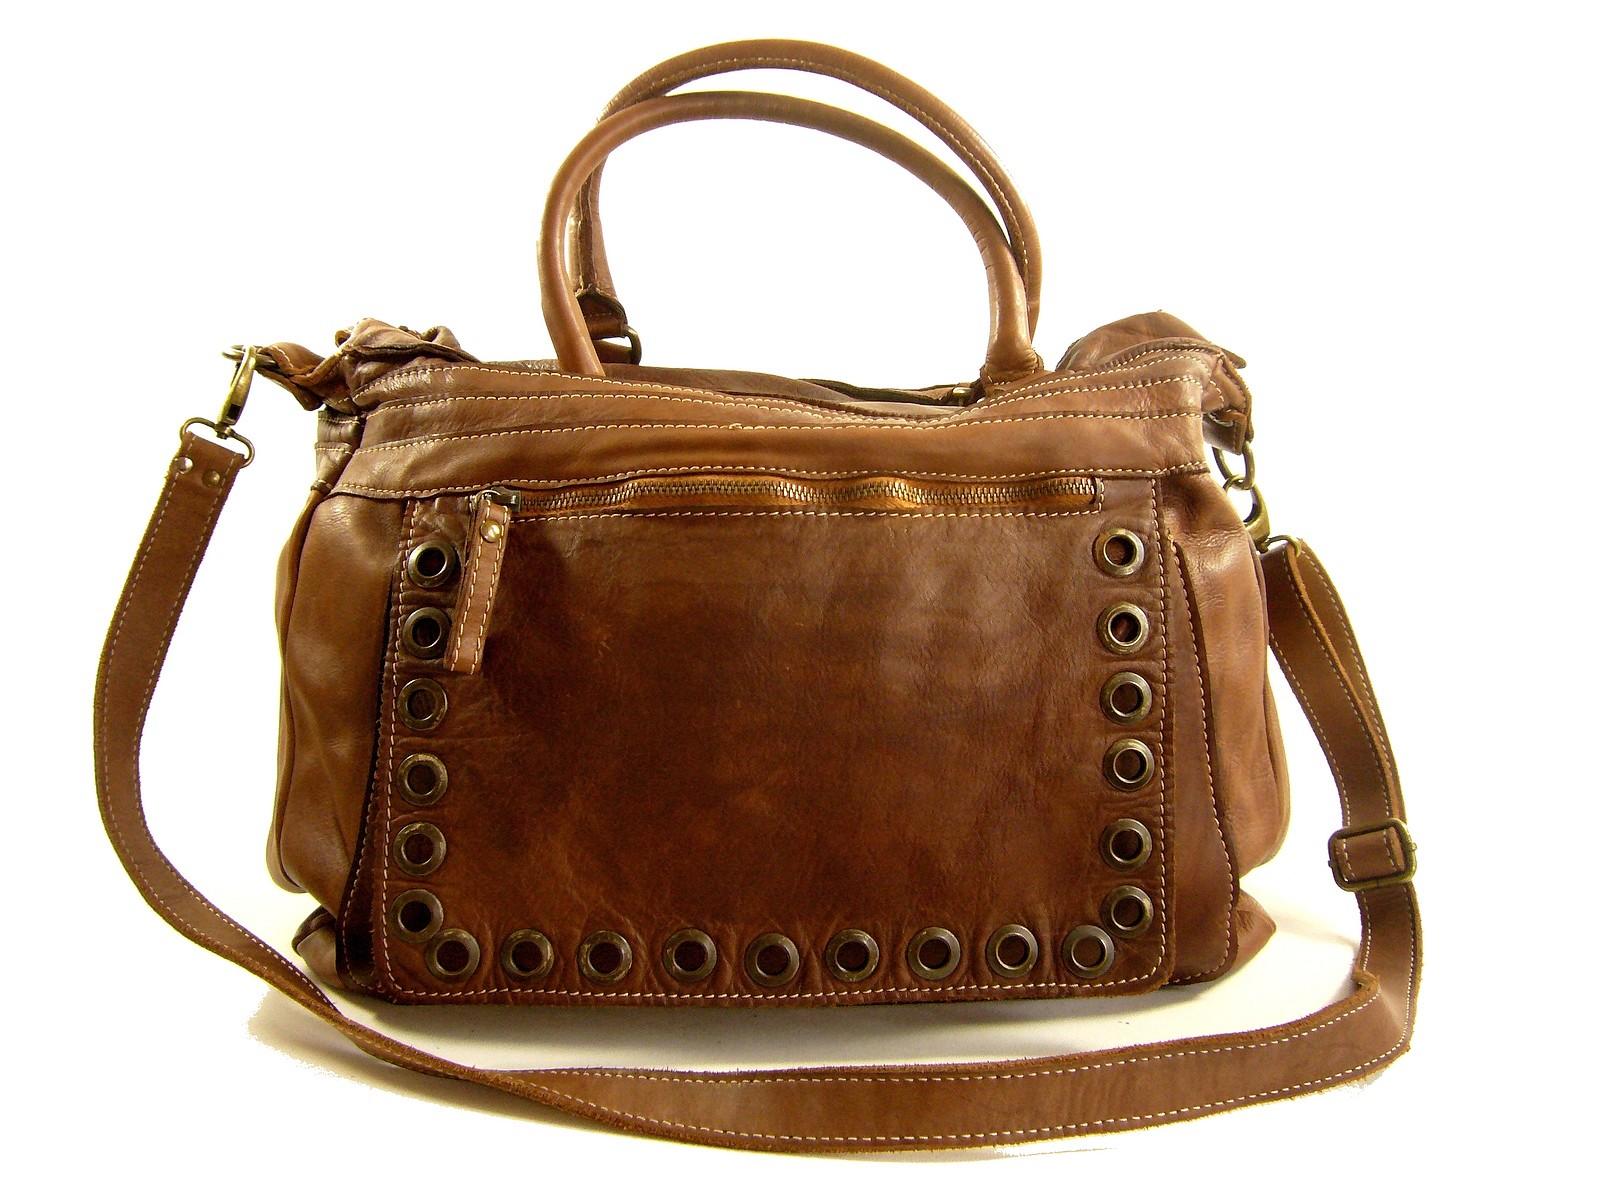 461dfd12f3 Sac épaule femme cuir vieilli naturel Riva / Collection Esprit Cuir